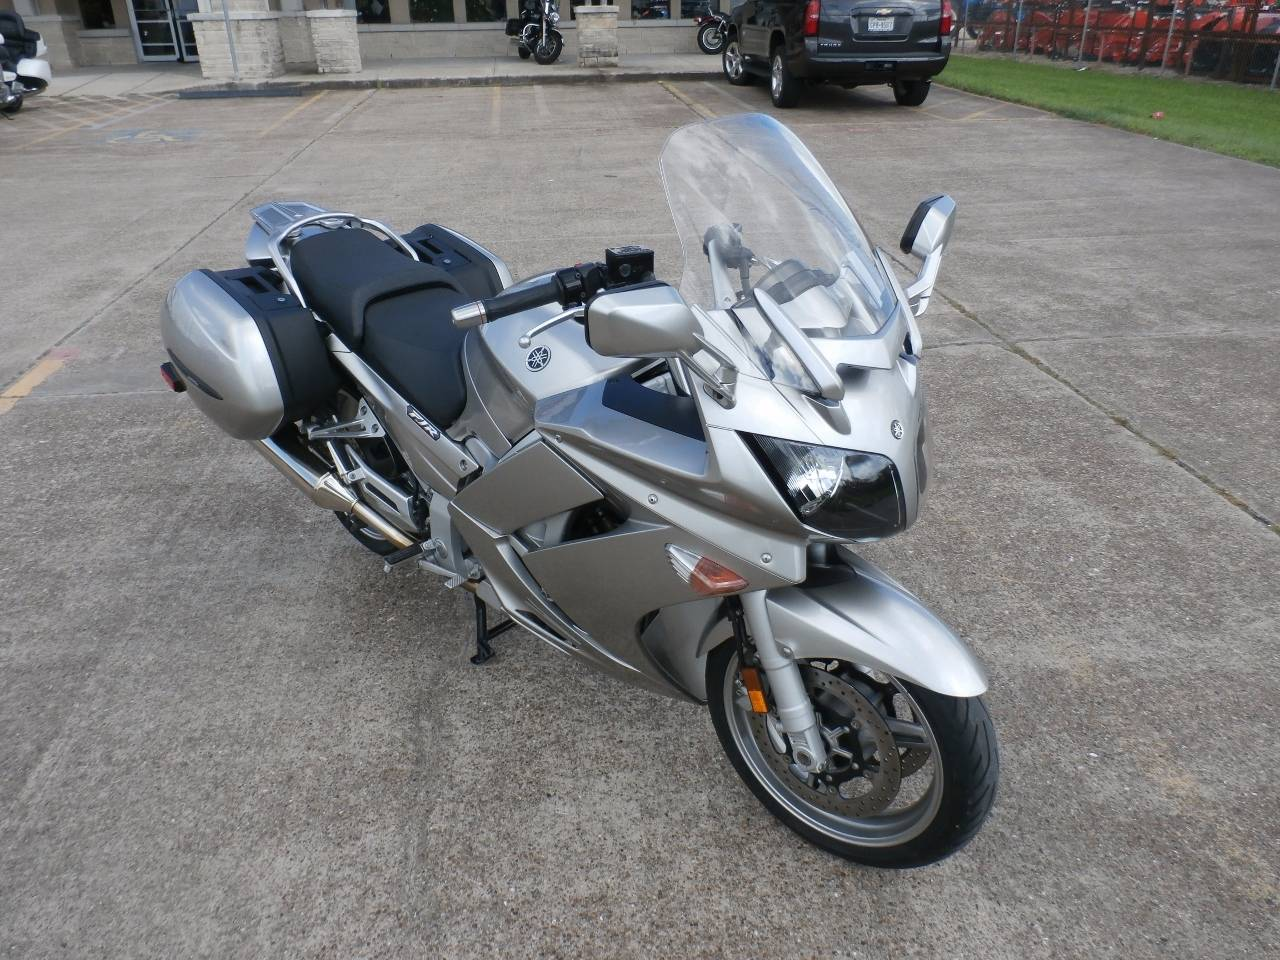 2011 Yamaha FJR1300A 2